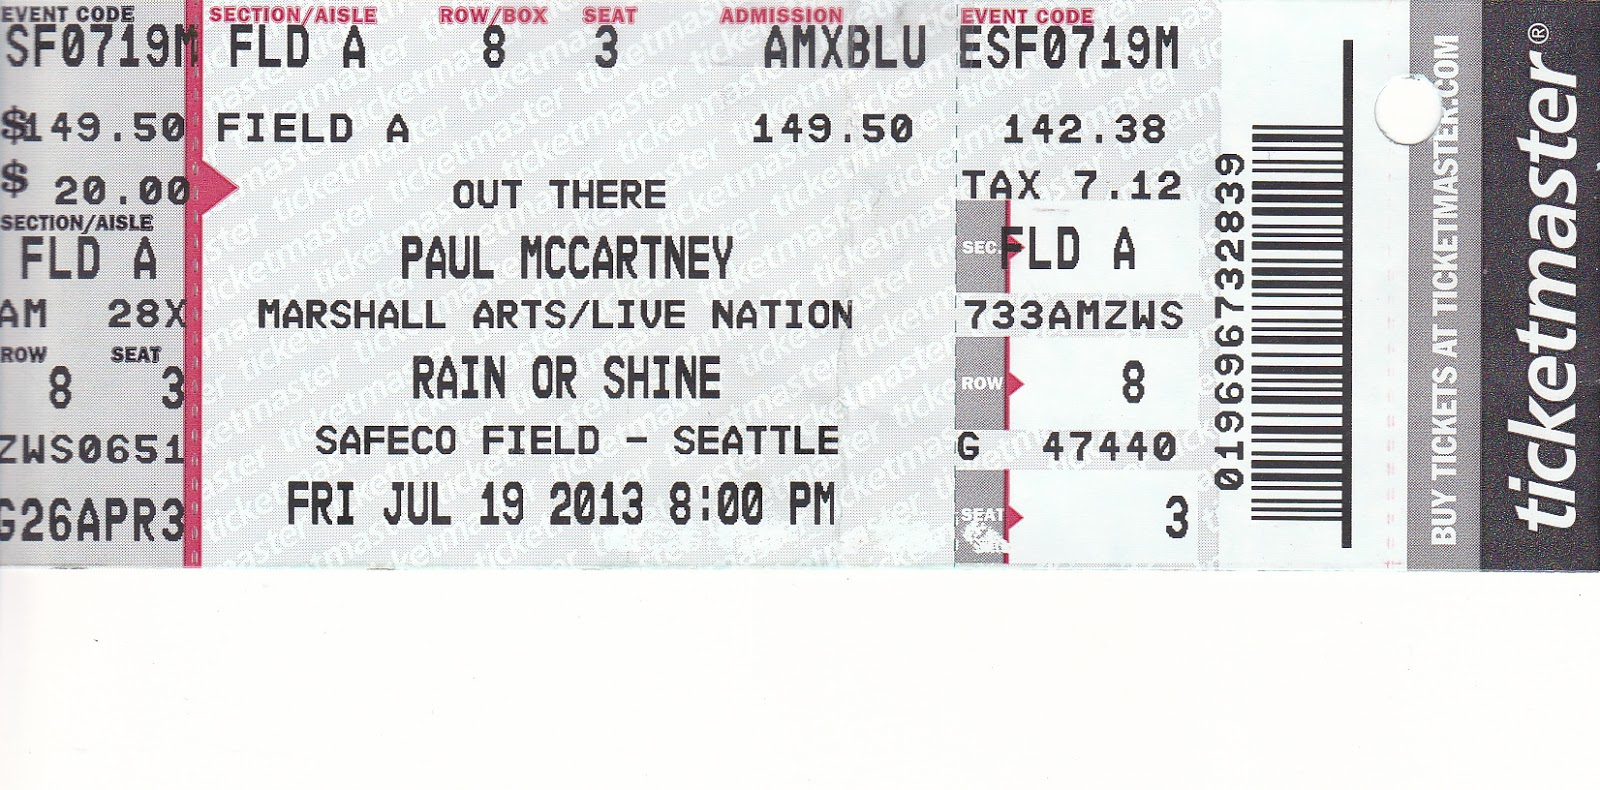 Concert Ticket Layout Concert Ticket Design Template Stylish – Concert Ticket Layout